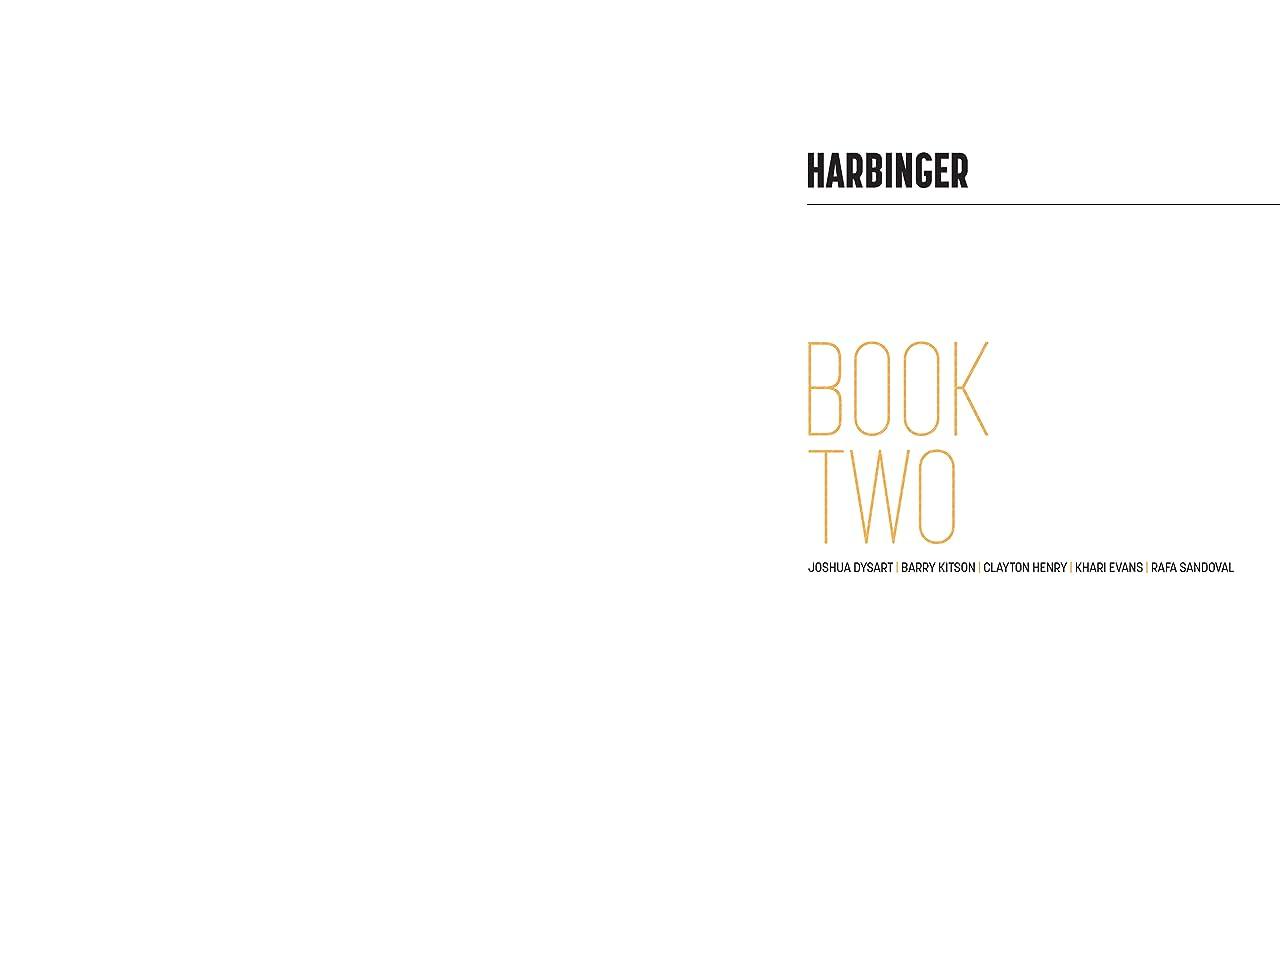 Harbinger Deluxe Edition Vol. 2